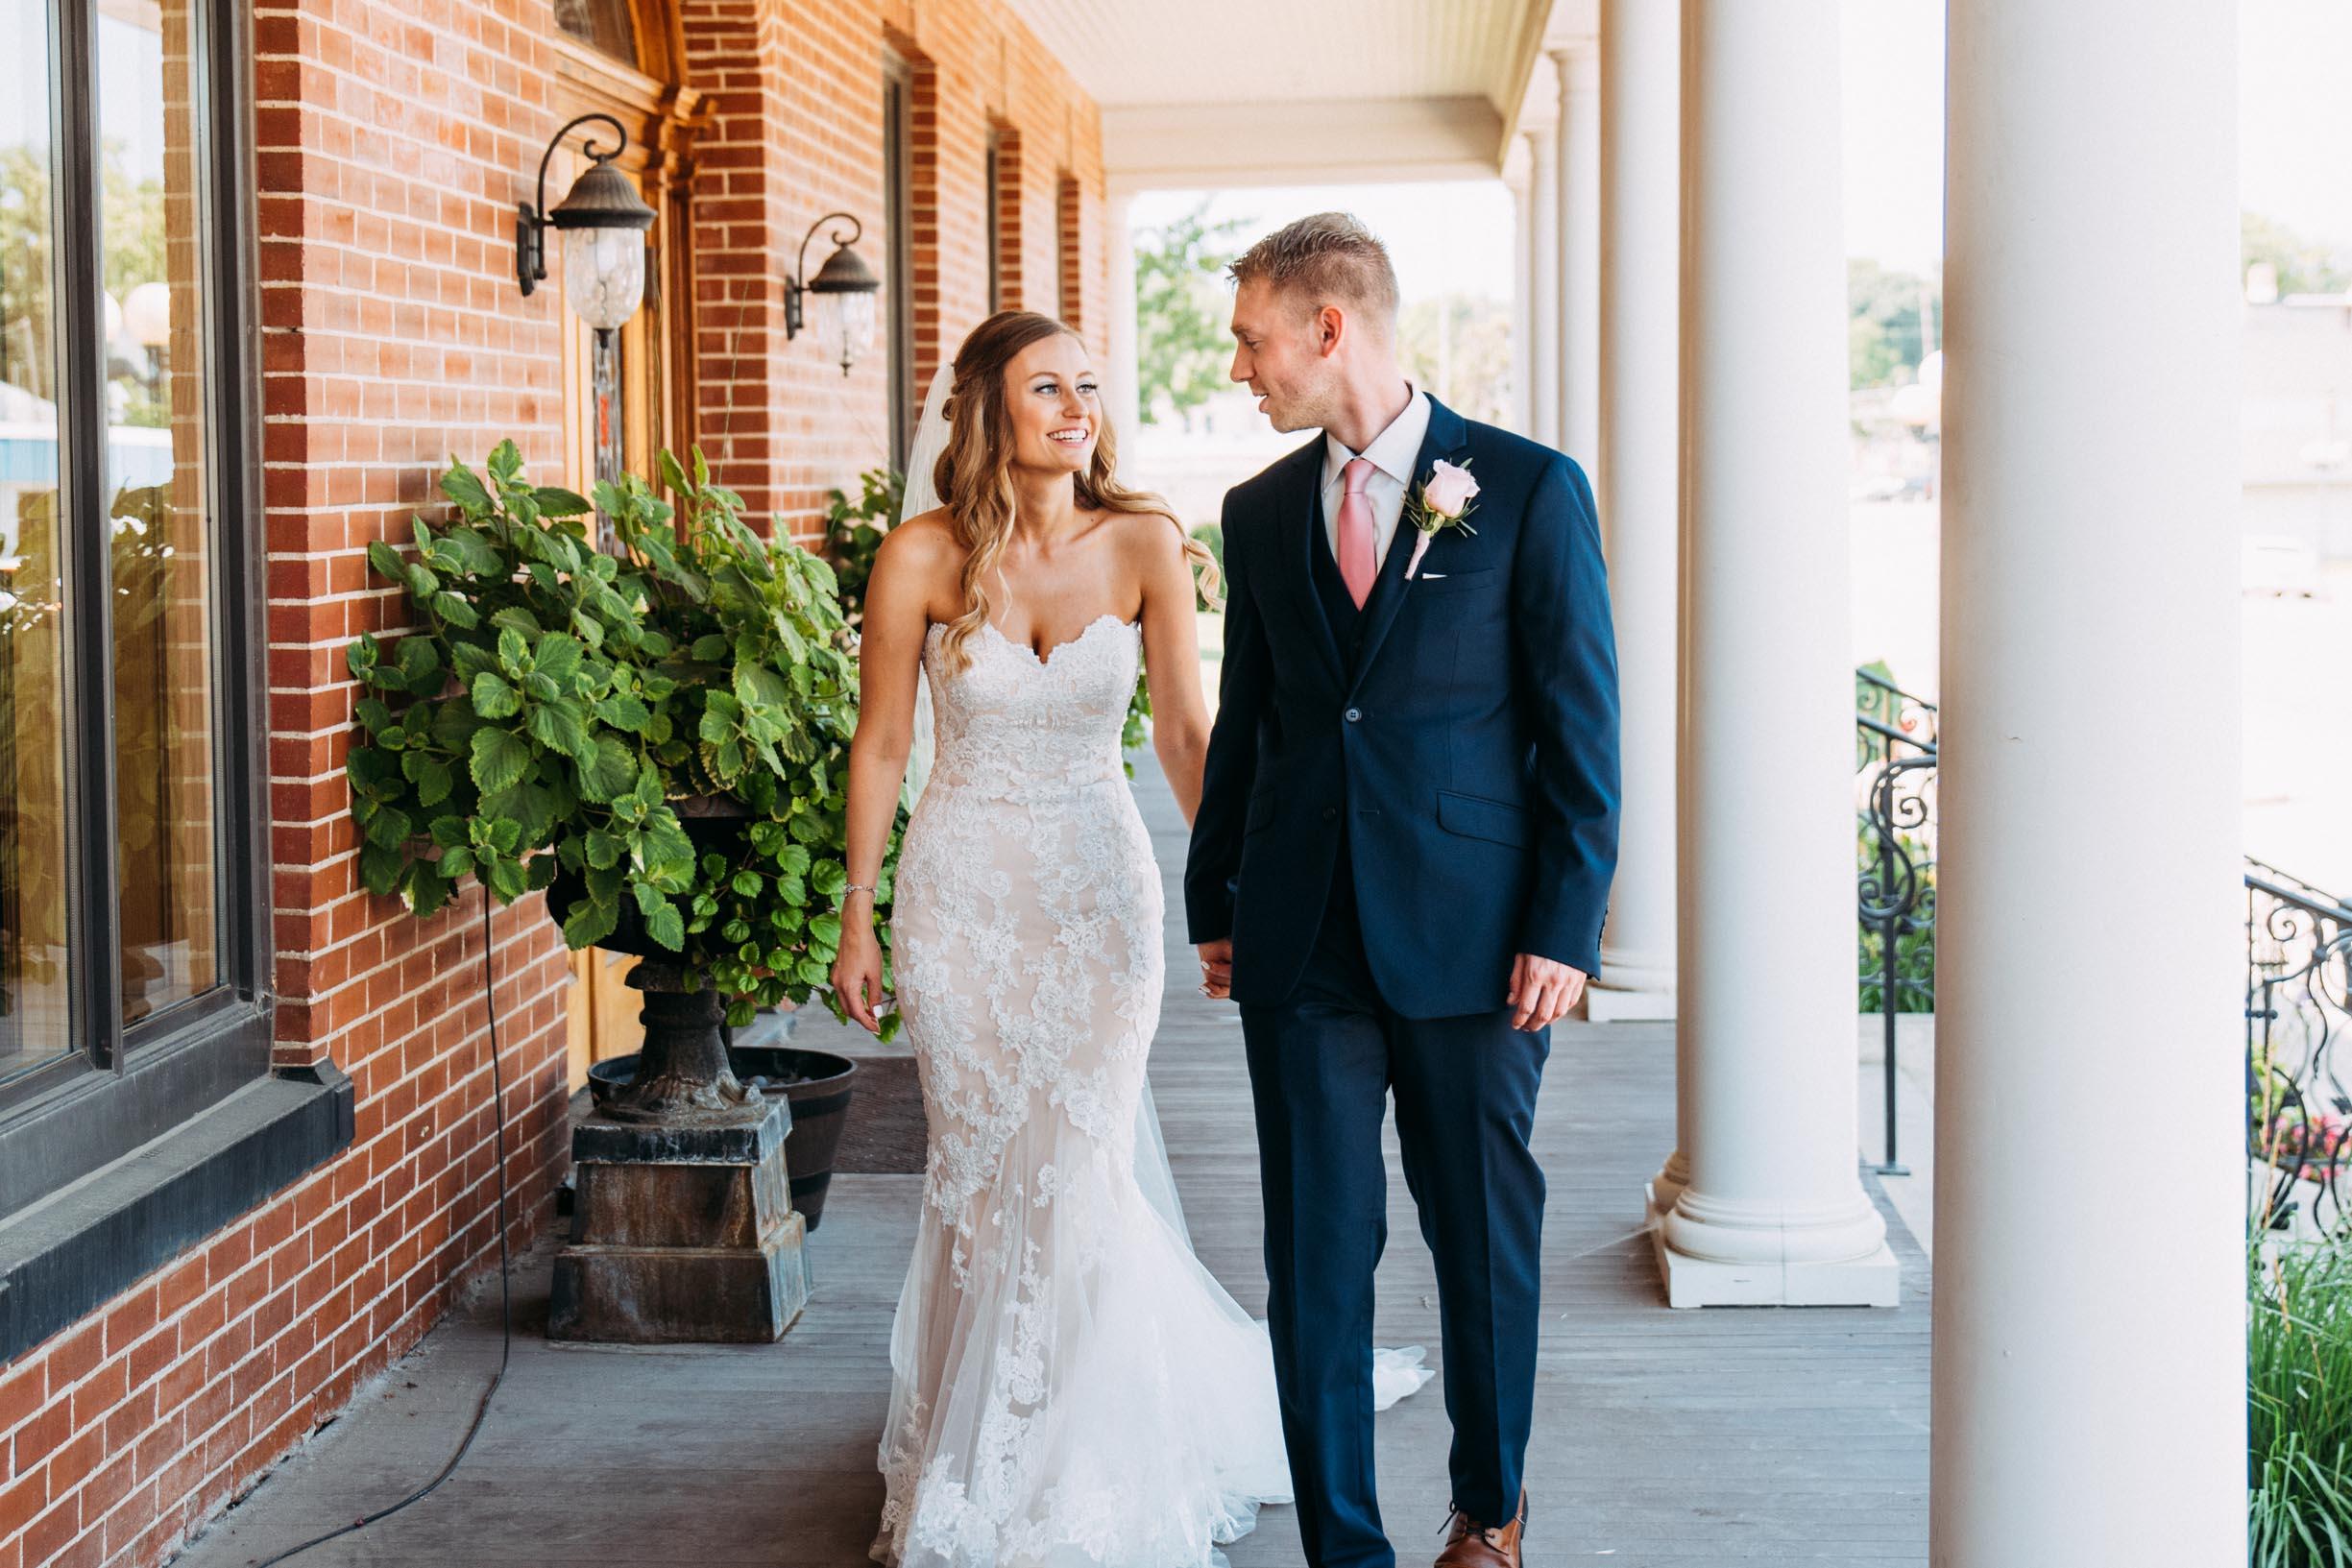 19-WeddingsattheBroz_Minnesota_WeddingBlog.jpg